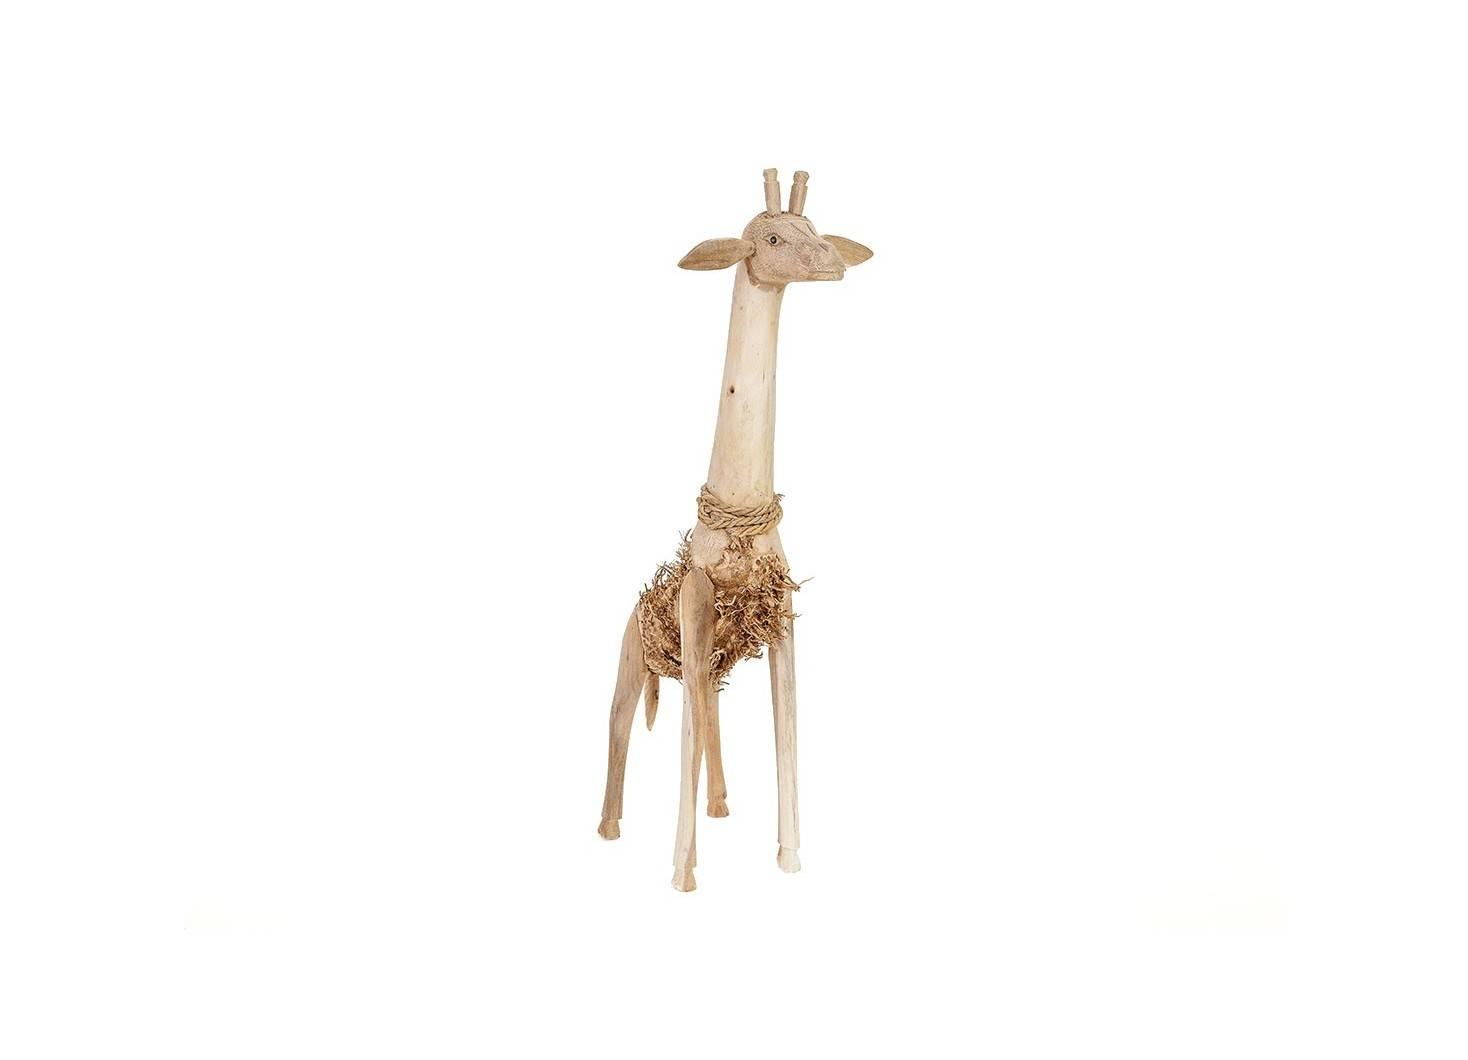 Giafe, sculpture en bois. Artisanat du monde.